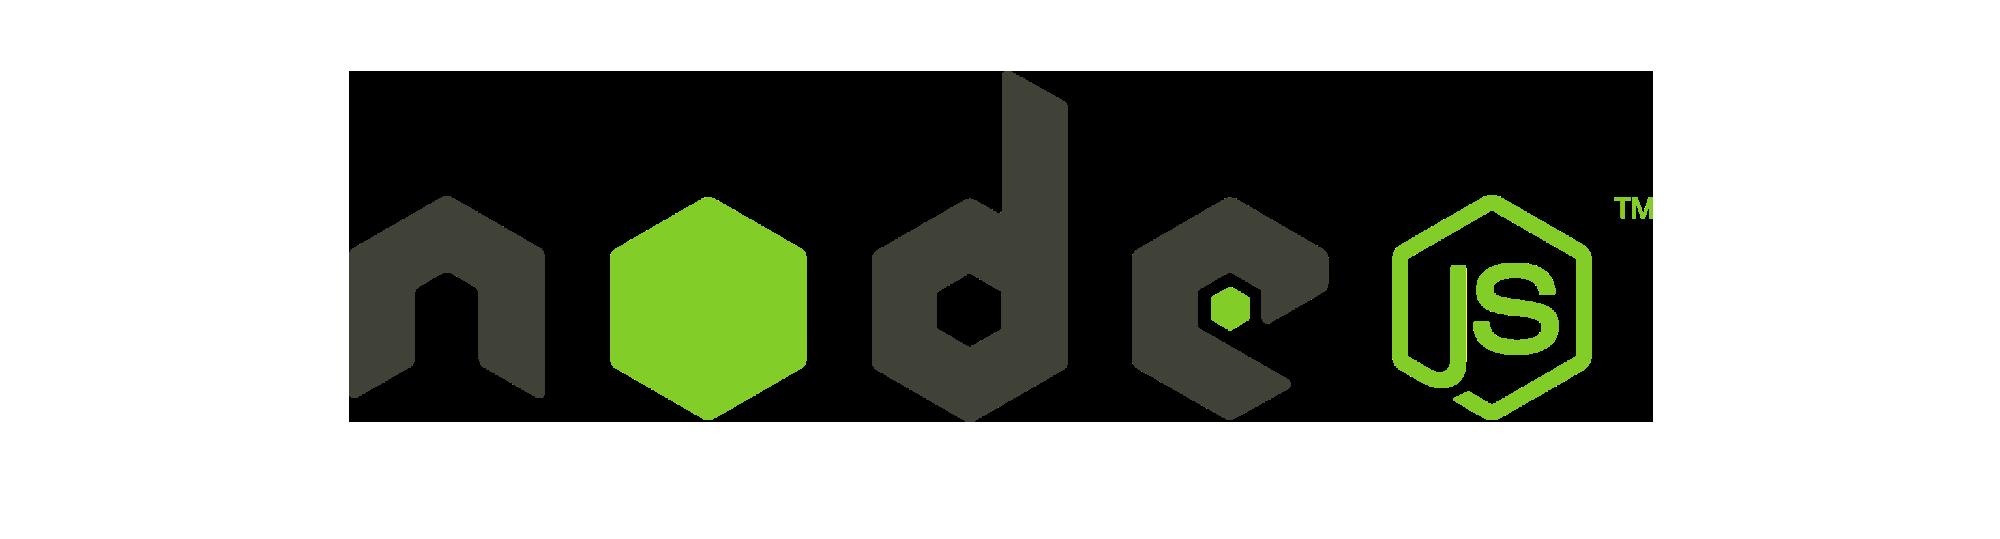 nodeJS_webserver